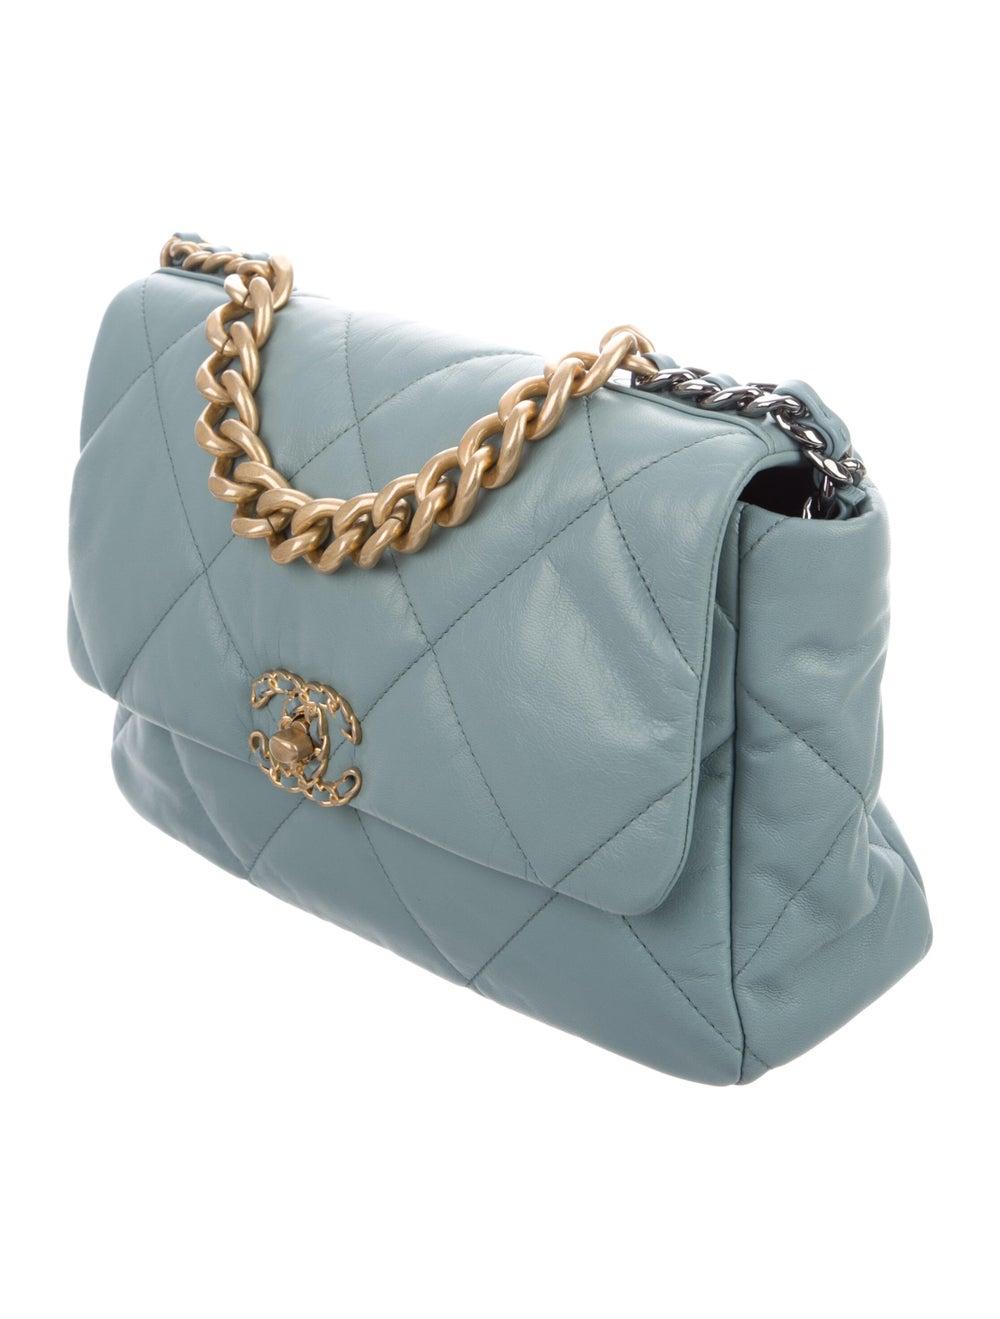 Chanel 2020 Large 19 Flap Bag Blue - image 3